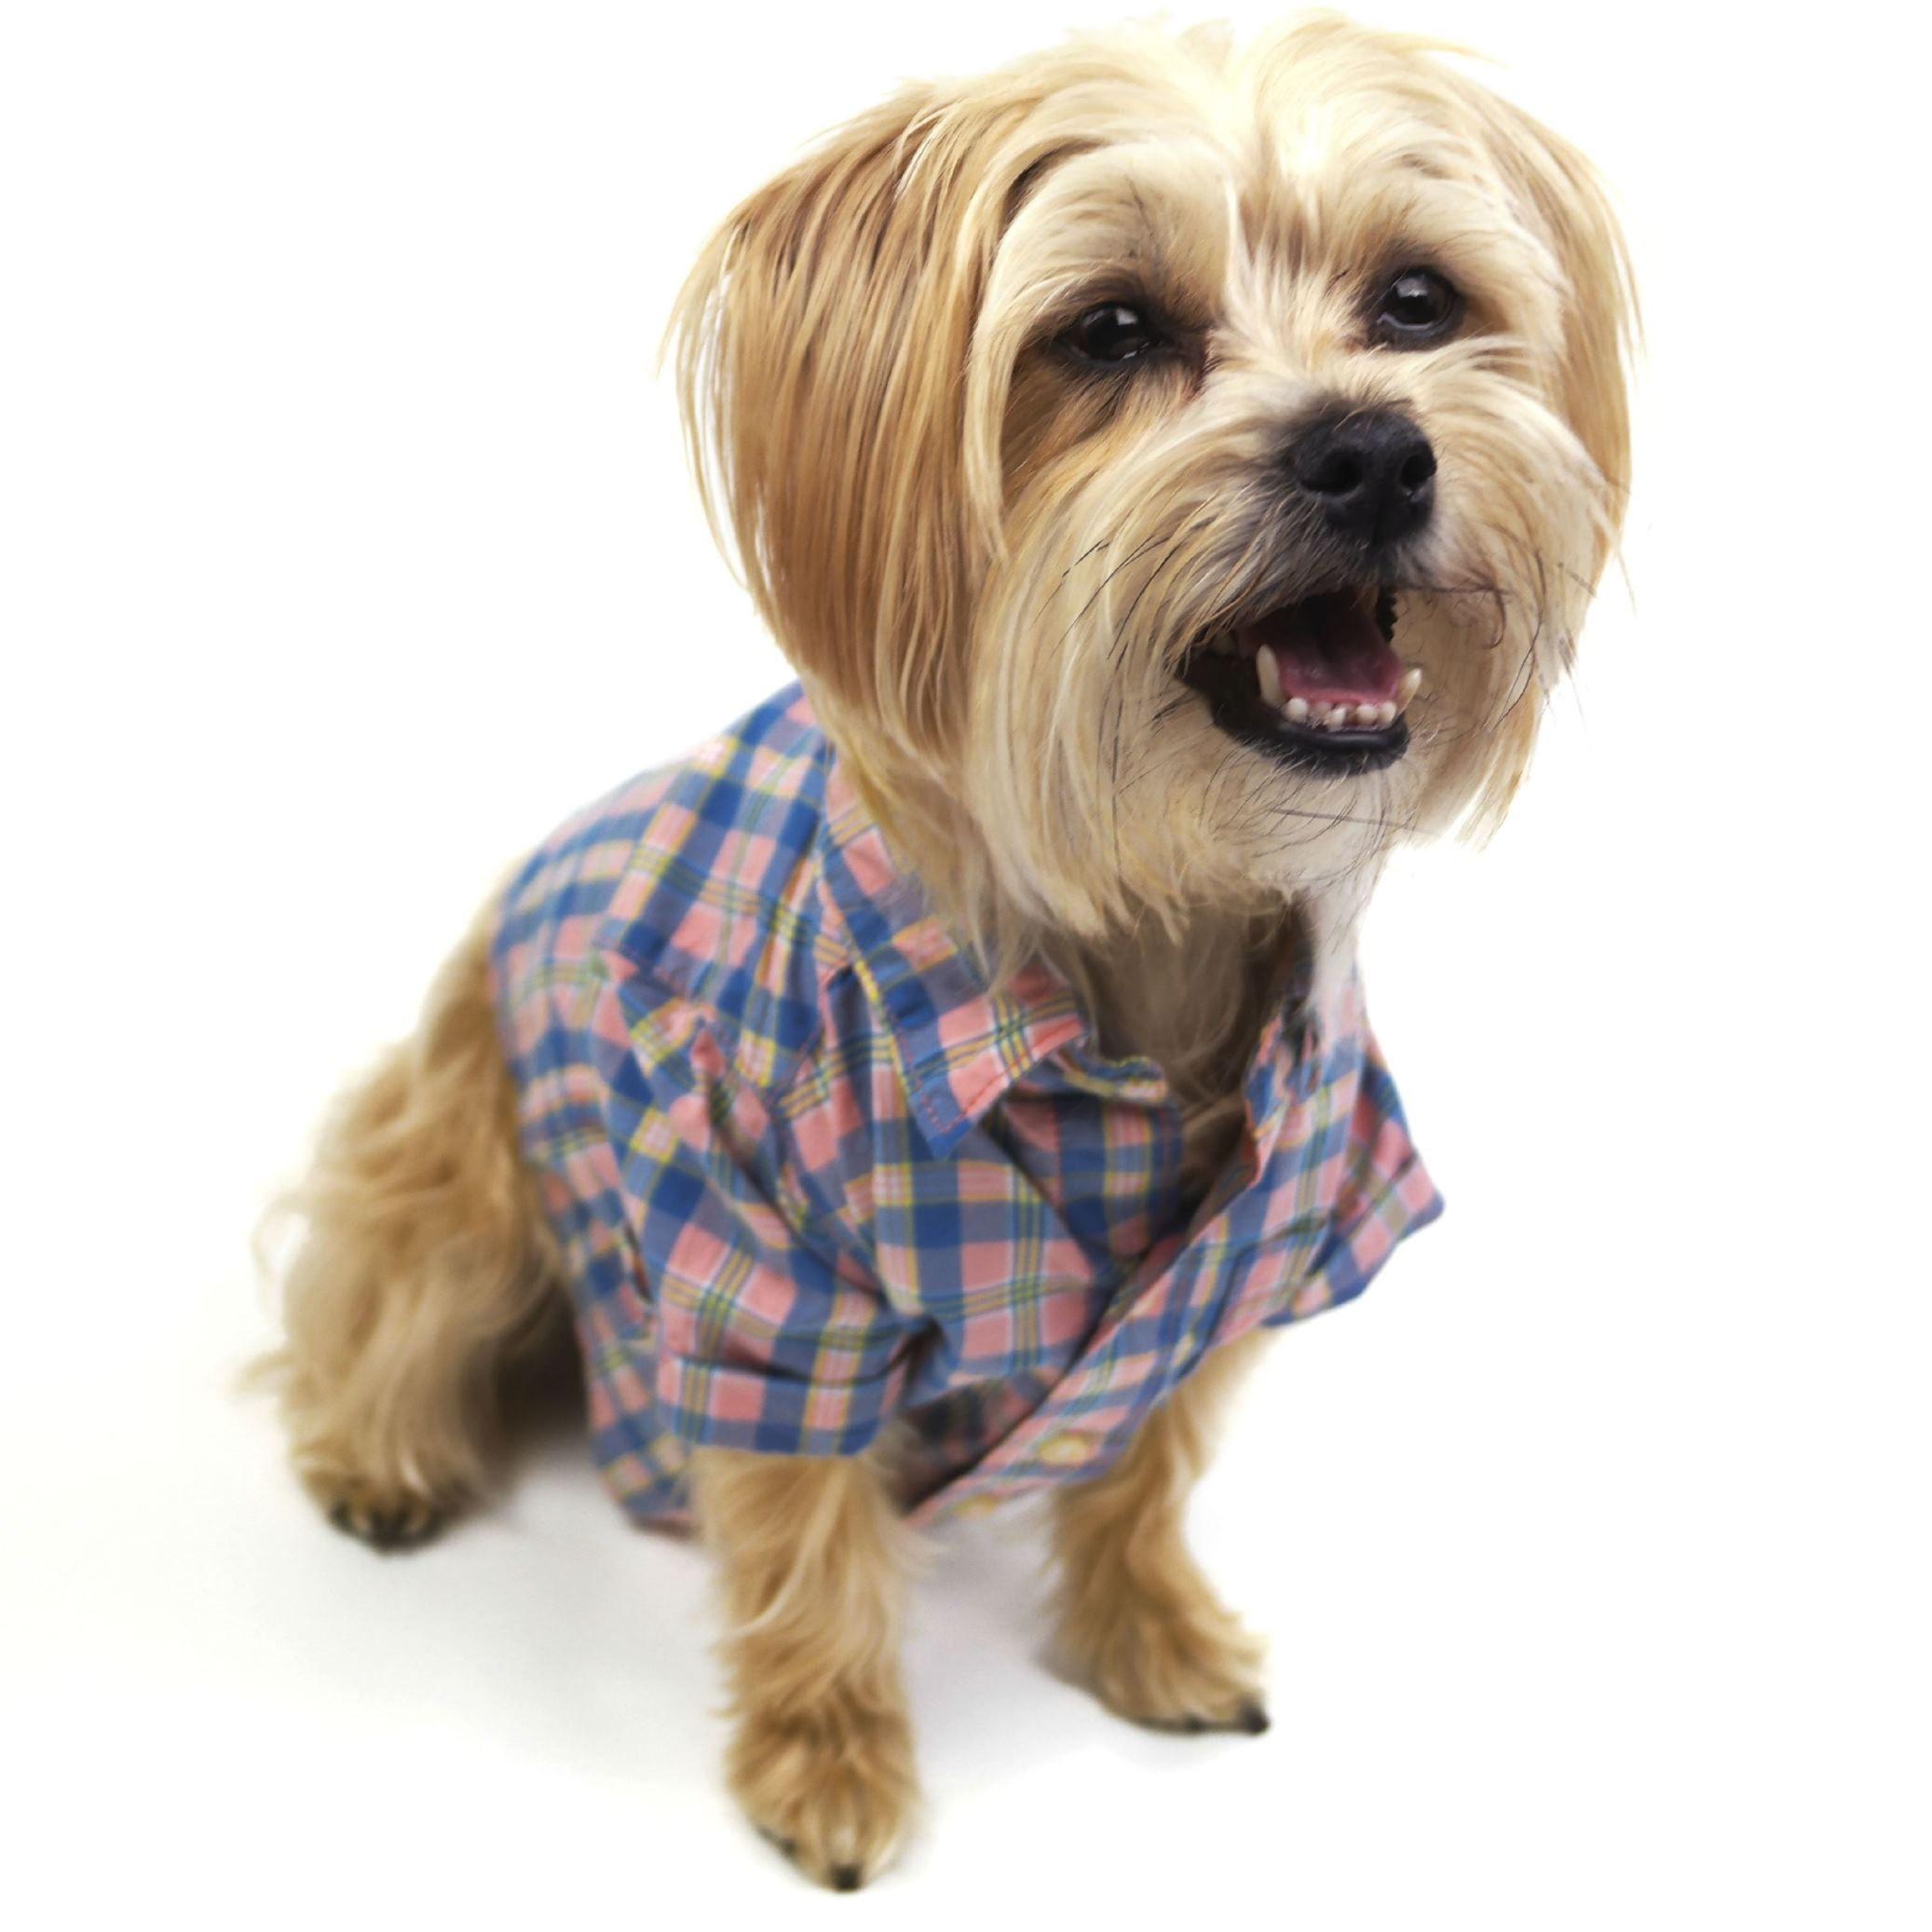 Greensboro Nc Maltese Mix Meet Snowbelle A Dog For Adoption Http Www Adoptapet Com Pet 18576504 Greensboro North Carolina Maltes Dog Adoption Dogs Pets